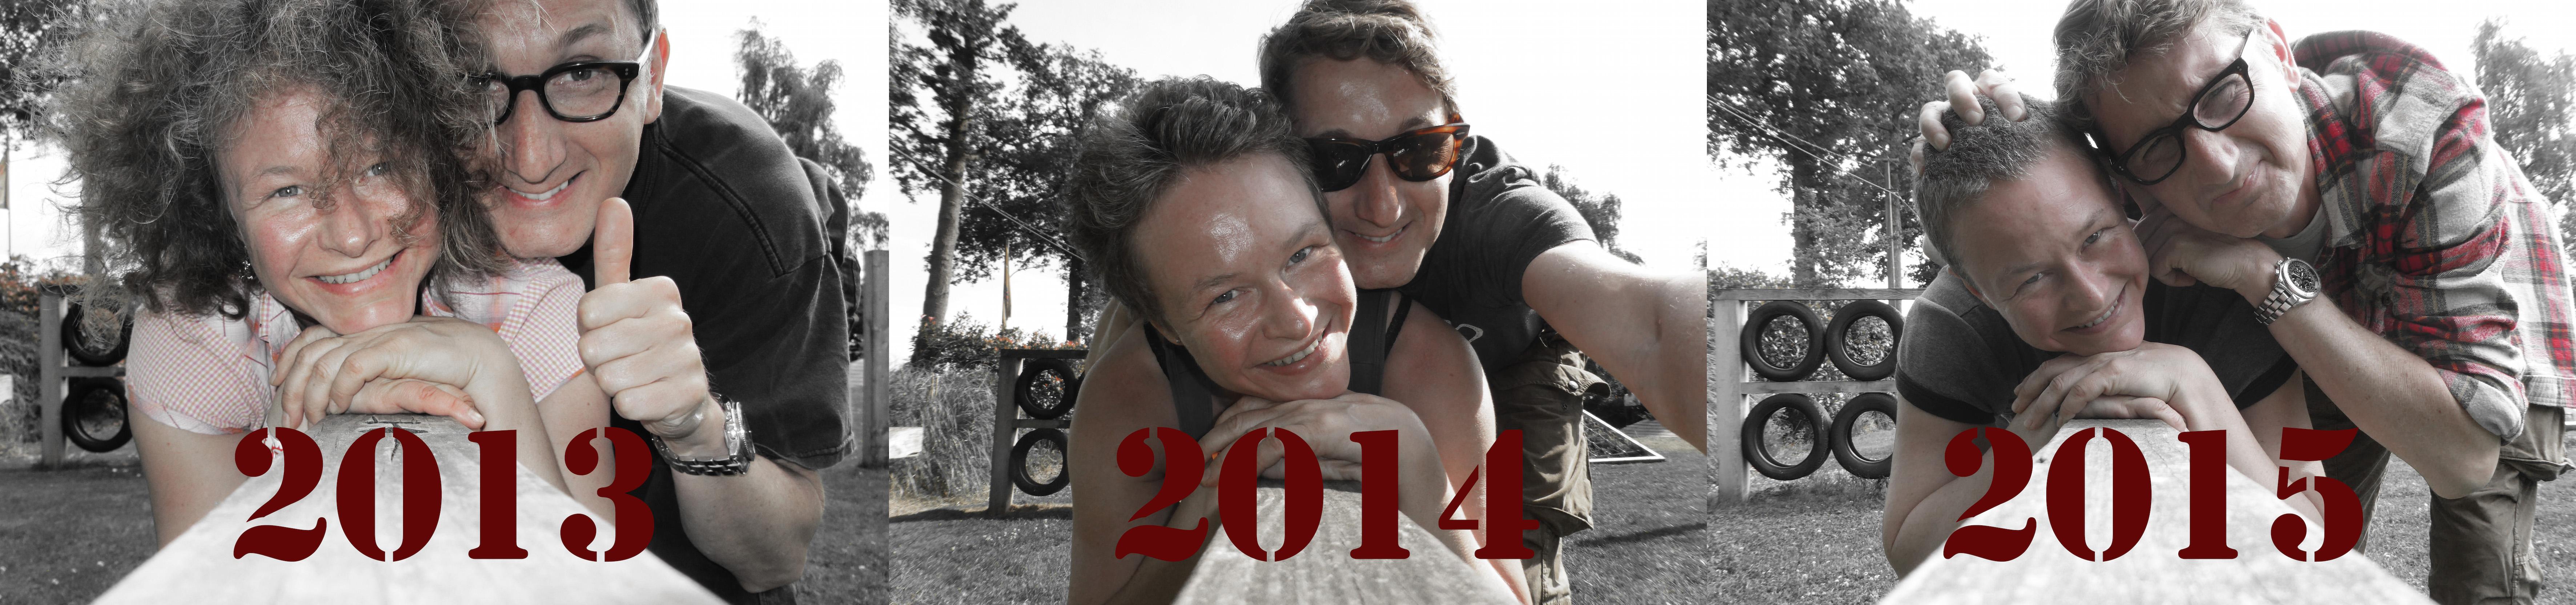 MuddyHair20131415